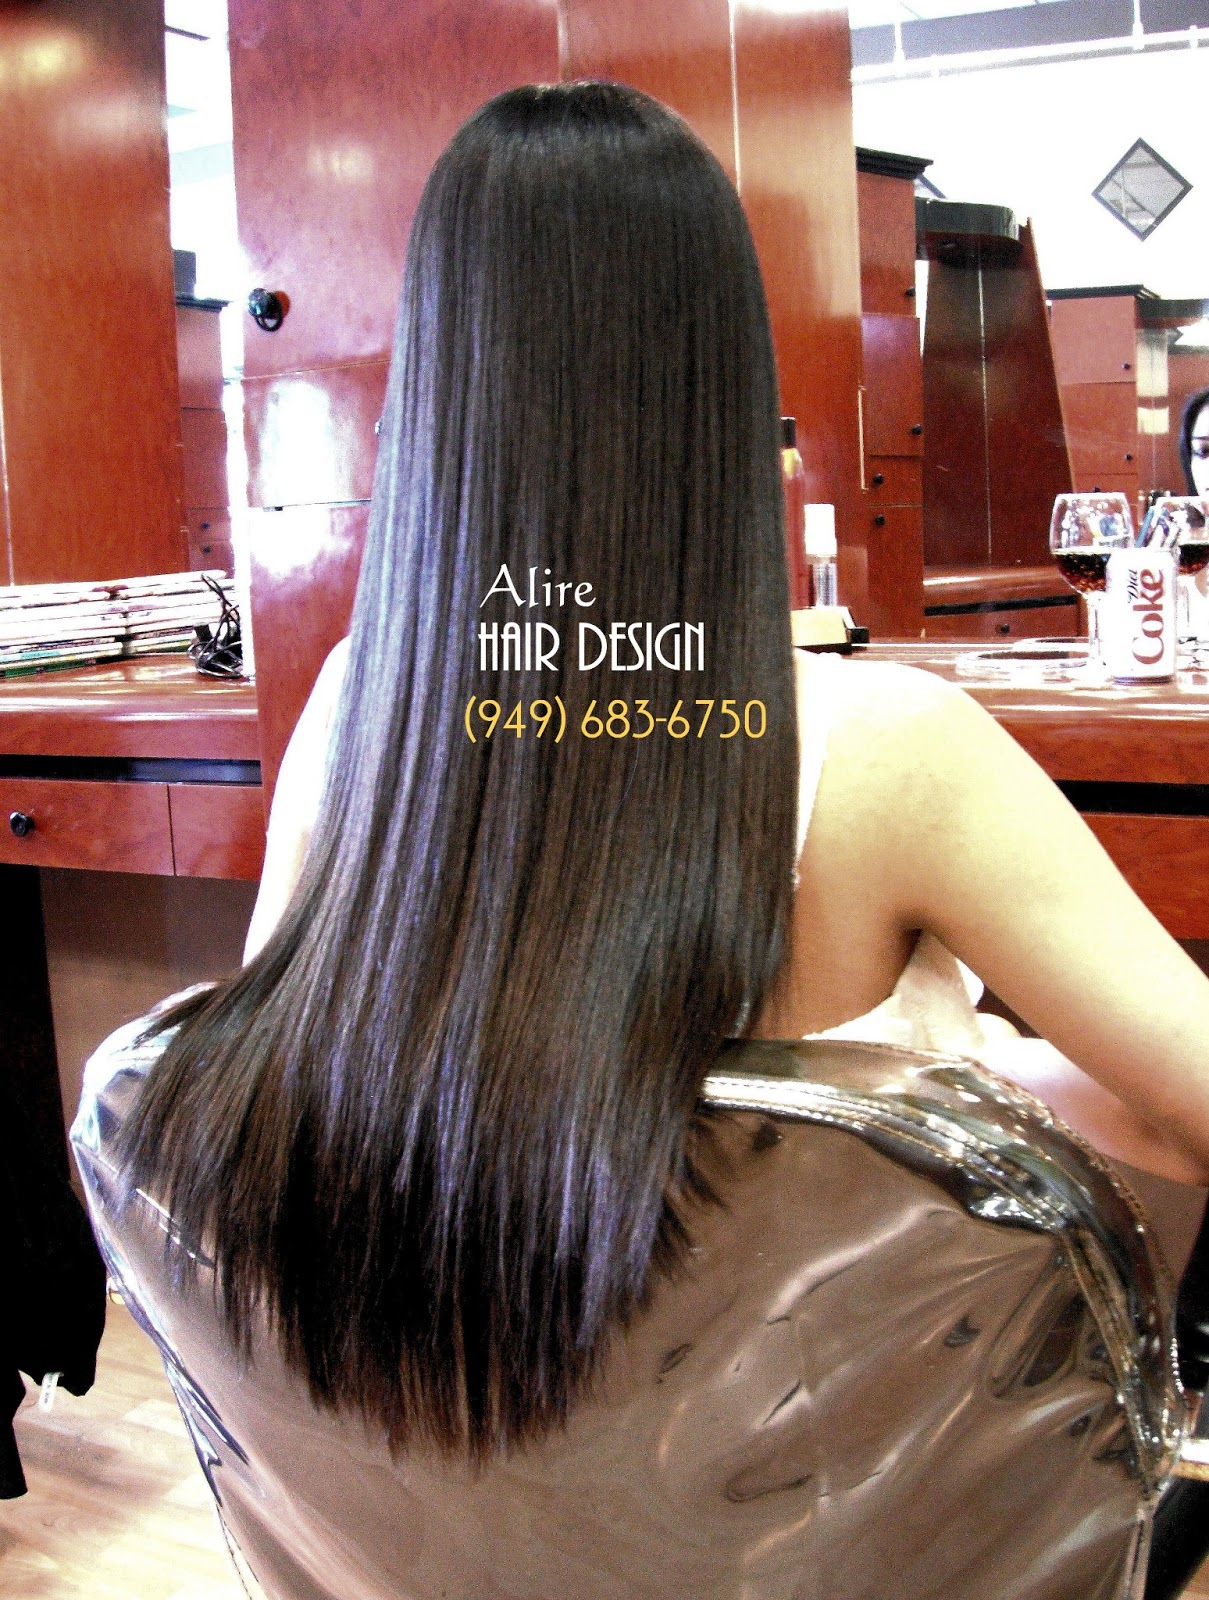 Japanese straight perm wash hair - Filename Japanese Permanent Hair Straightening Treatment Orange County Irvine Jpg